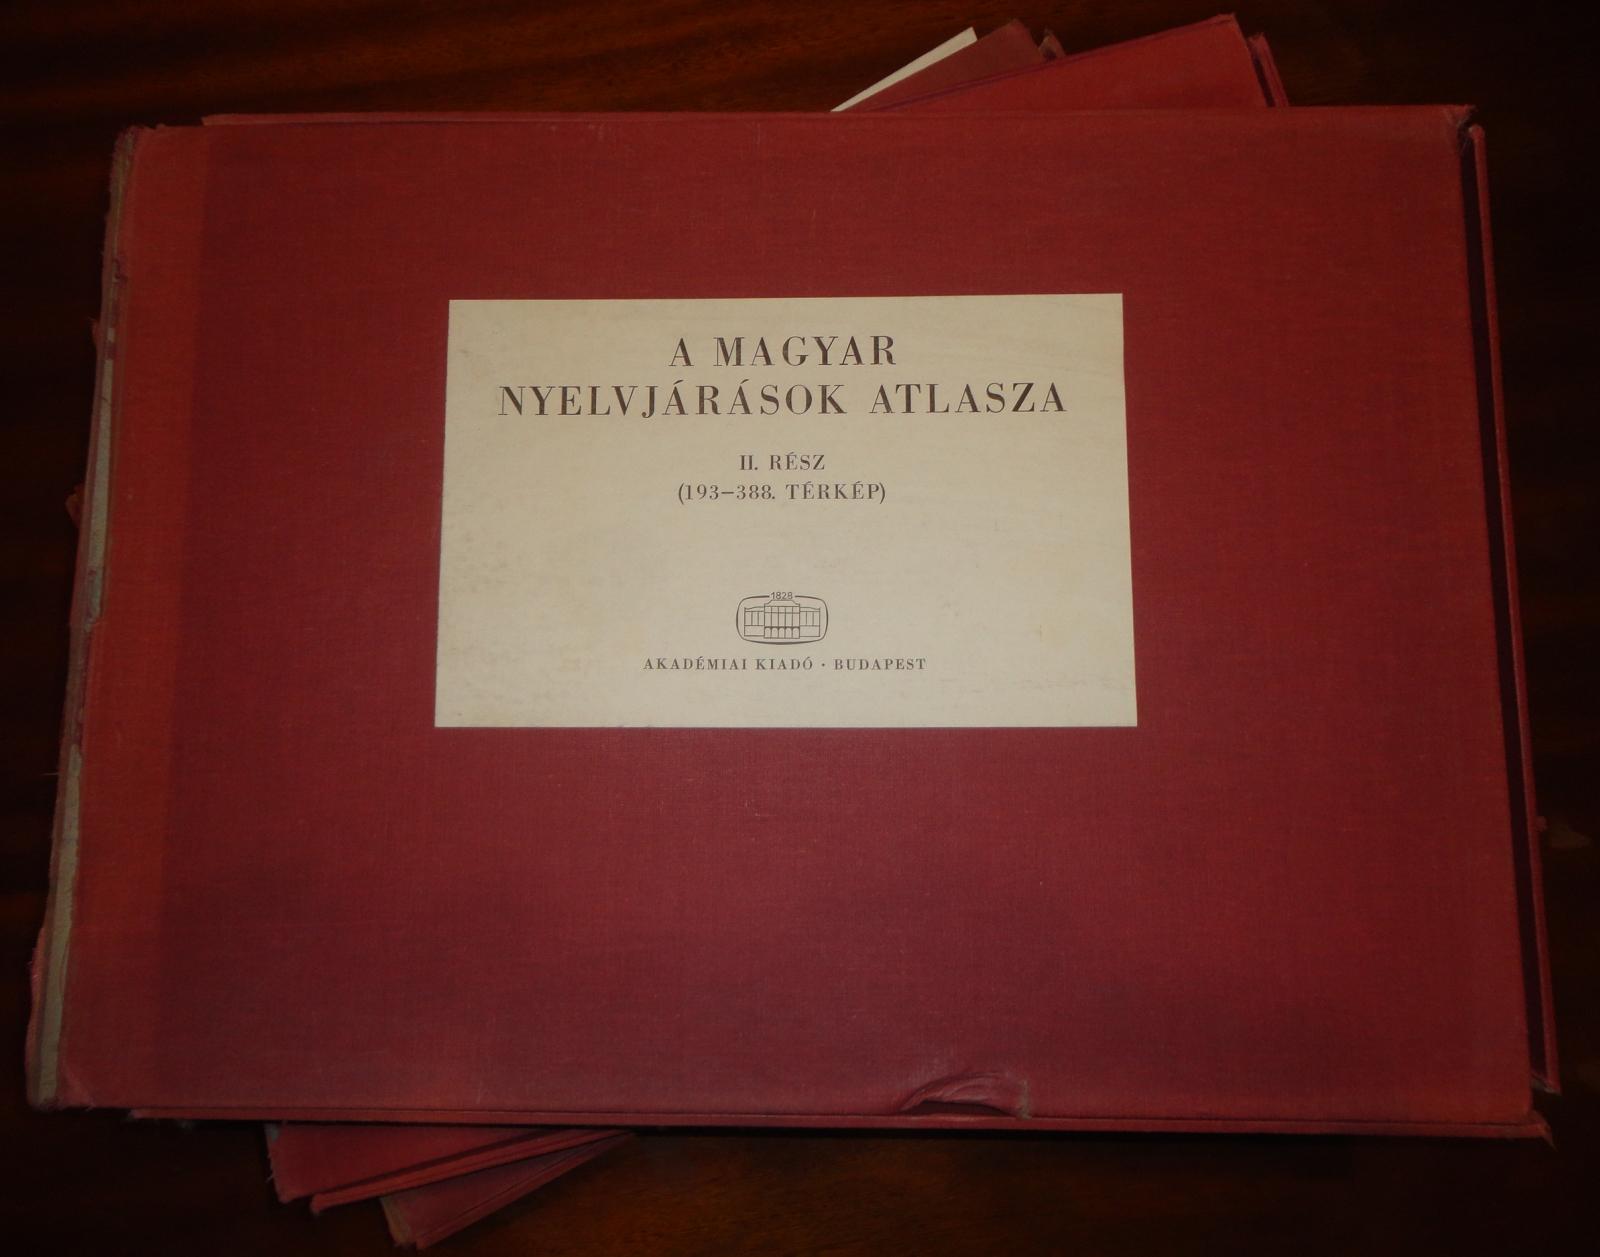 02-magyar-nyelvjarasok-atlasza.jpg